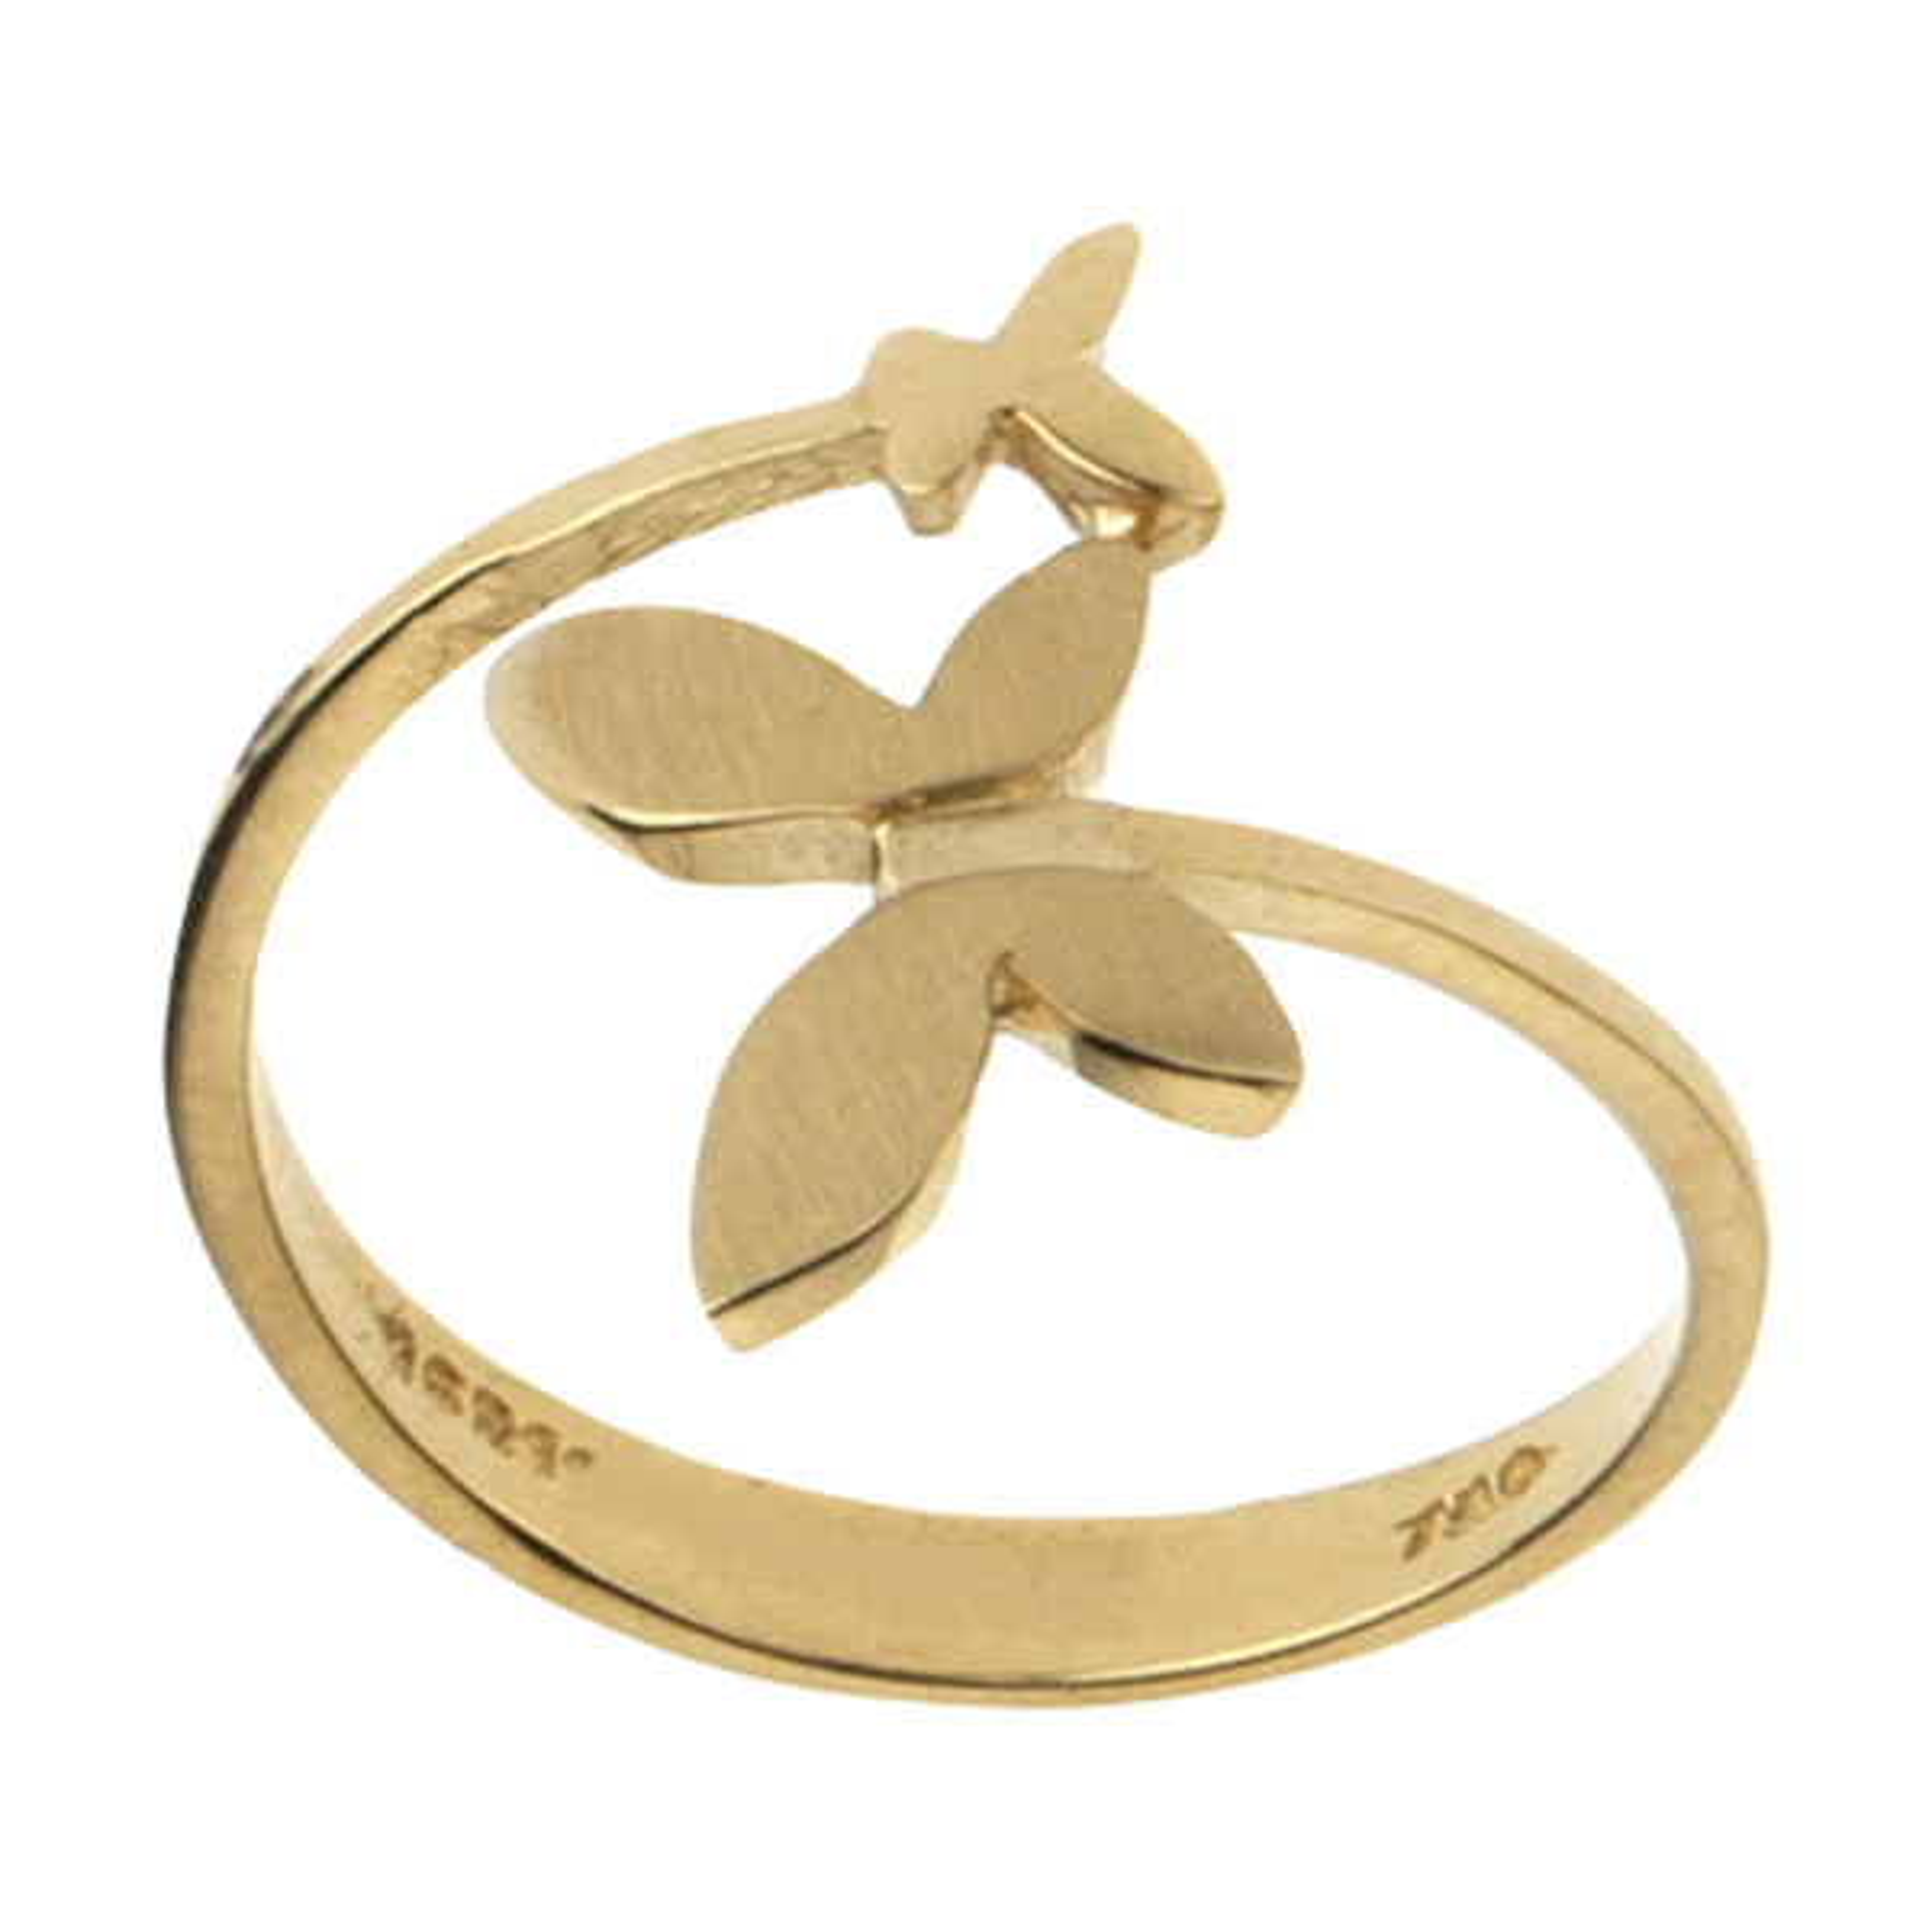 انگشتر طلا 18 عیار زنانه مدیسا مدل R1008-55